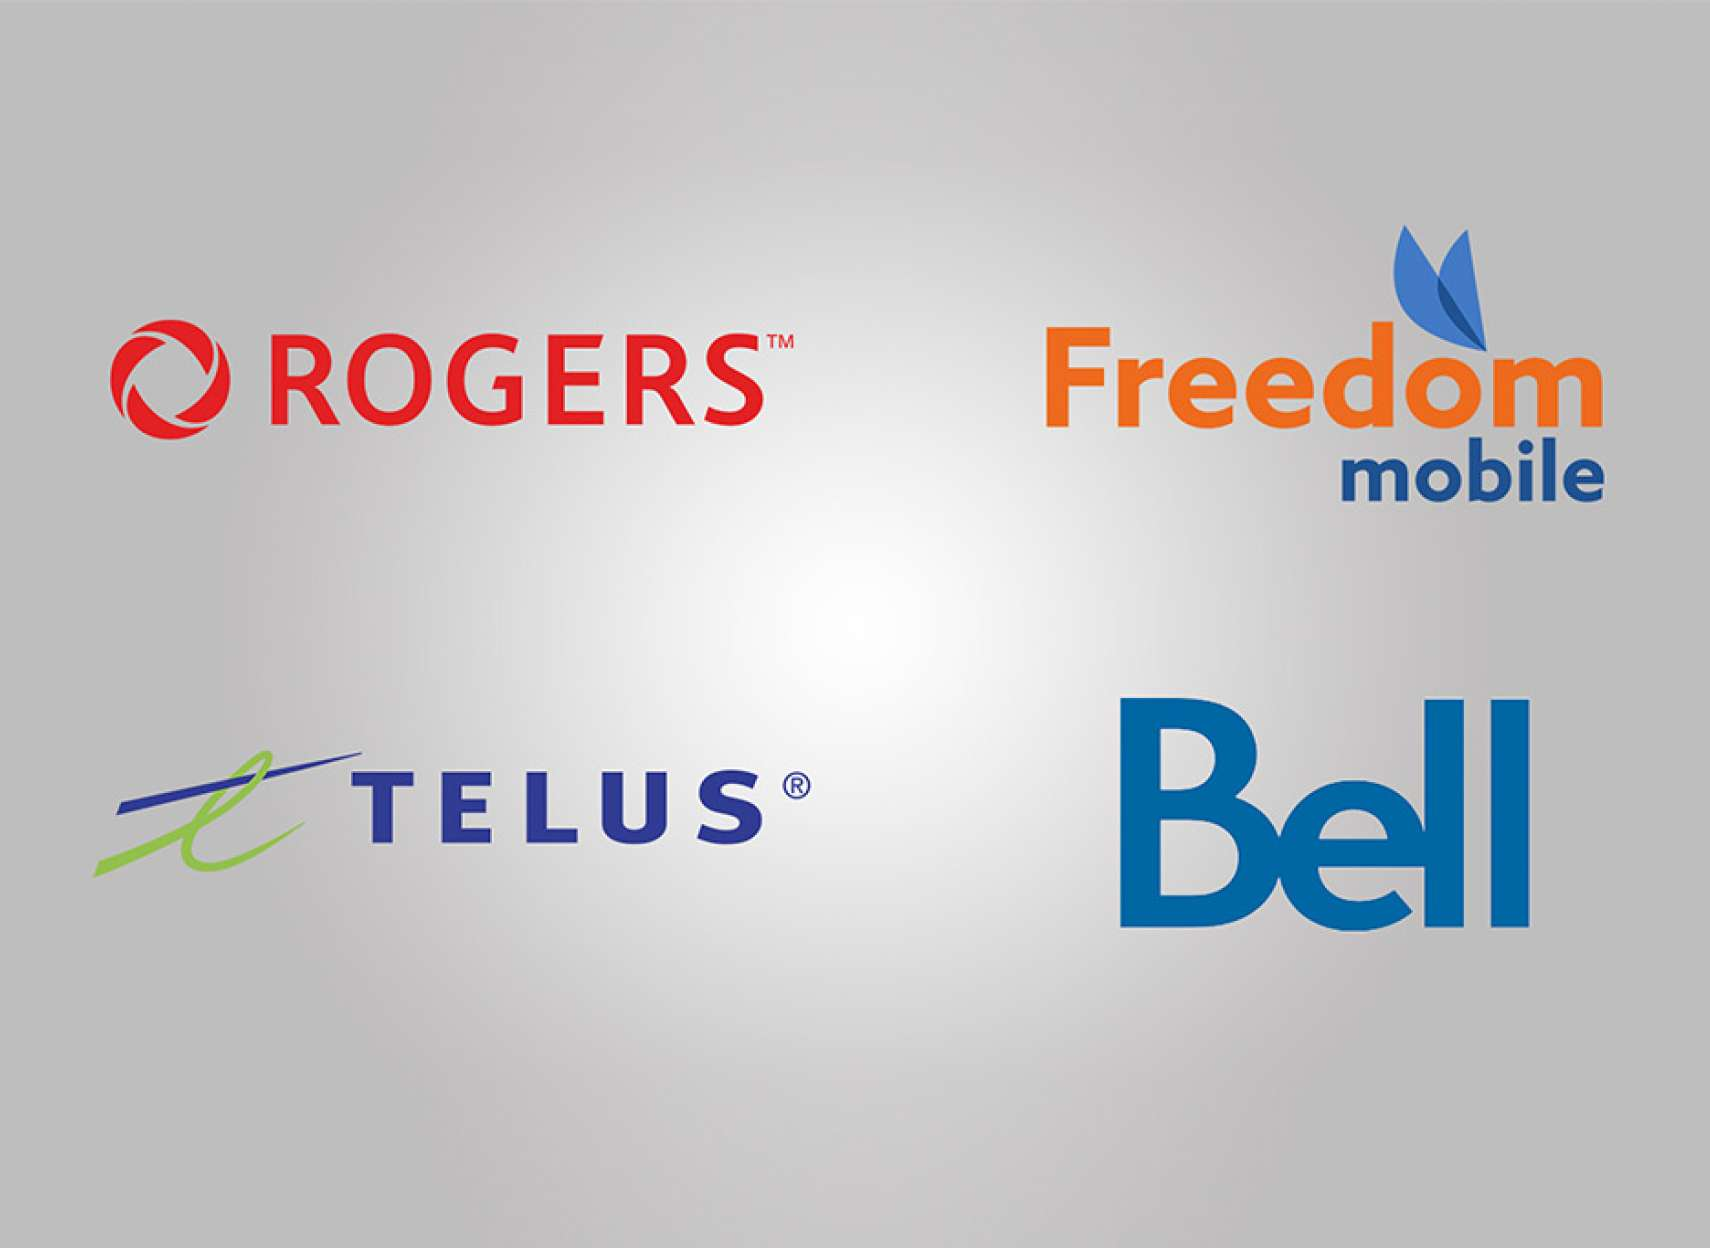 اخبار-کانادا-شرکت-مخابرات-راجرز-کانادا-به-مشکل-عدم-تماس-برخورد